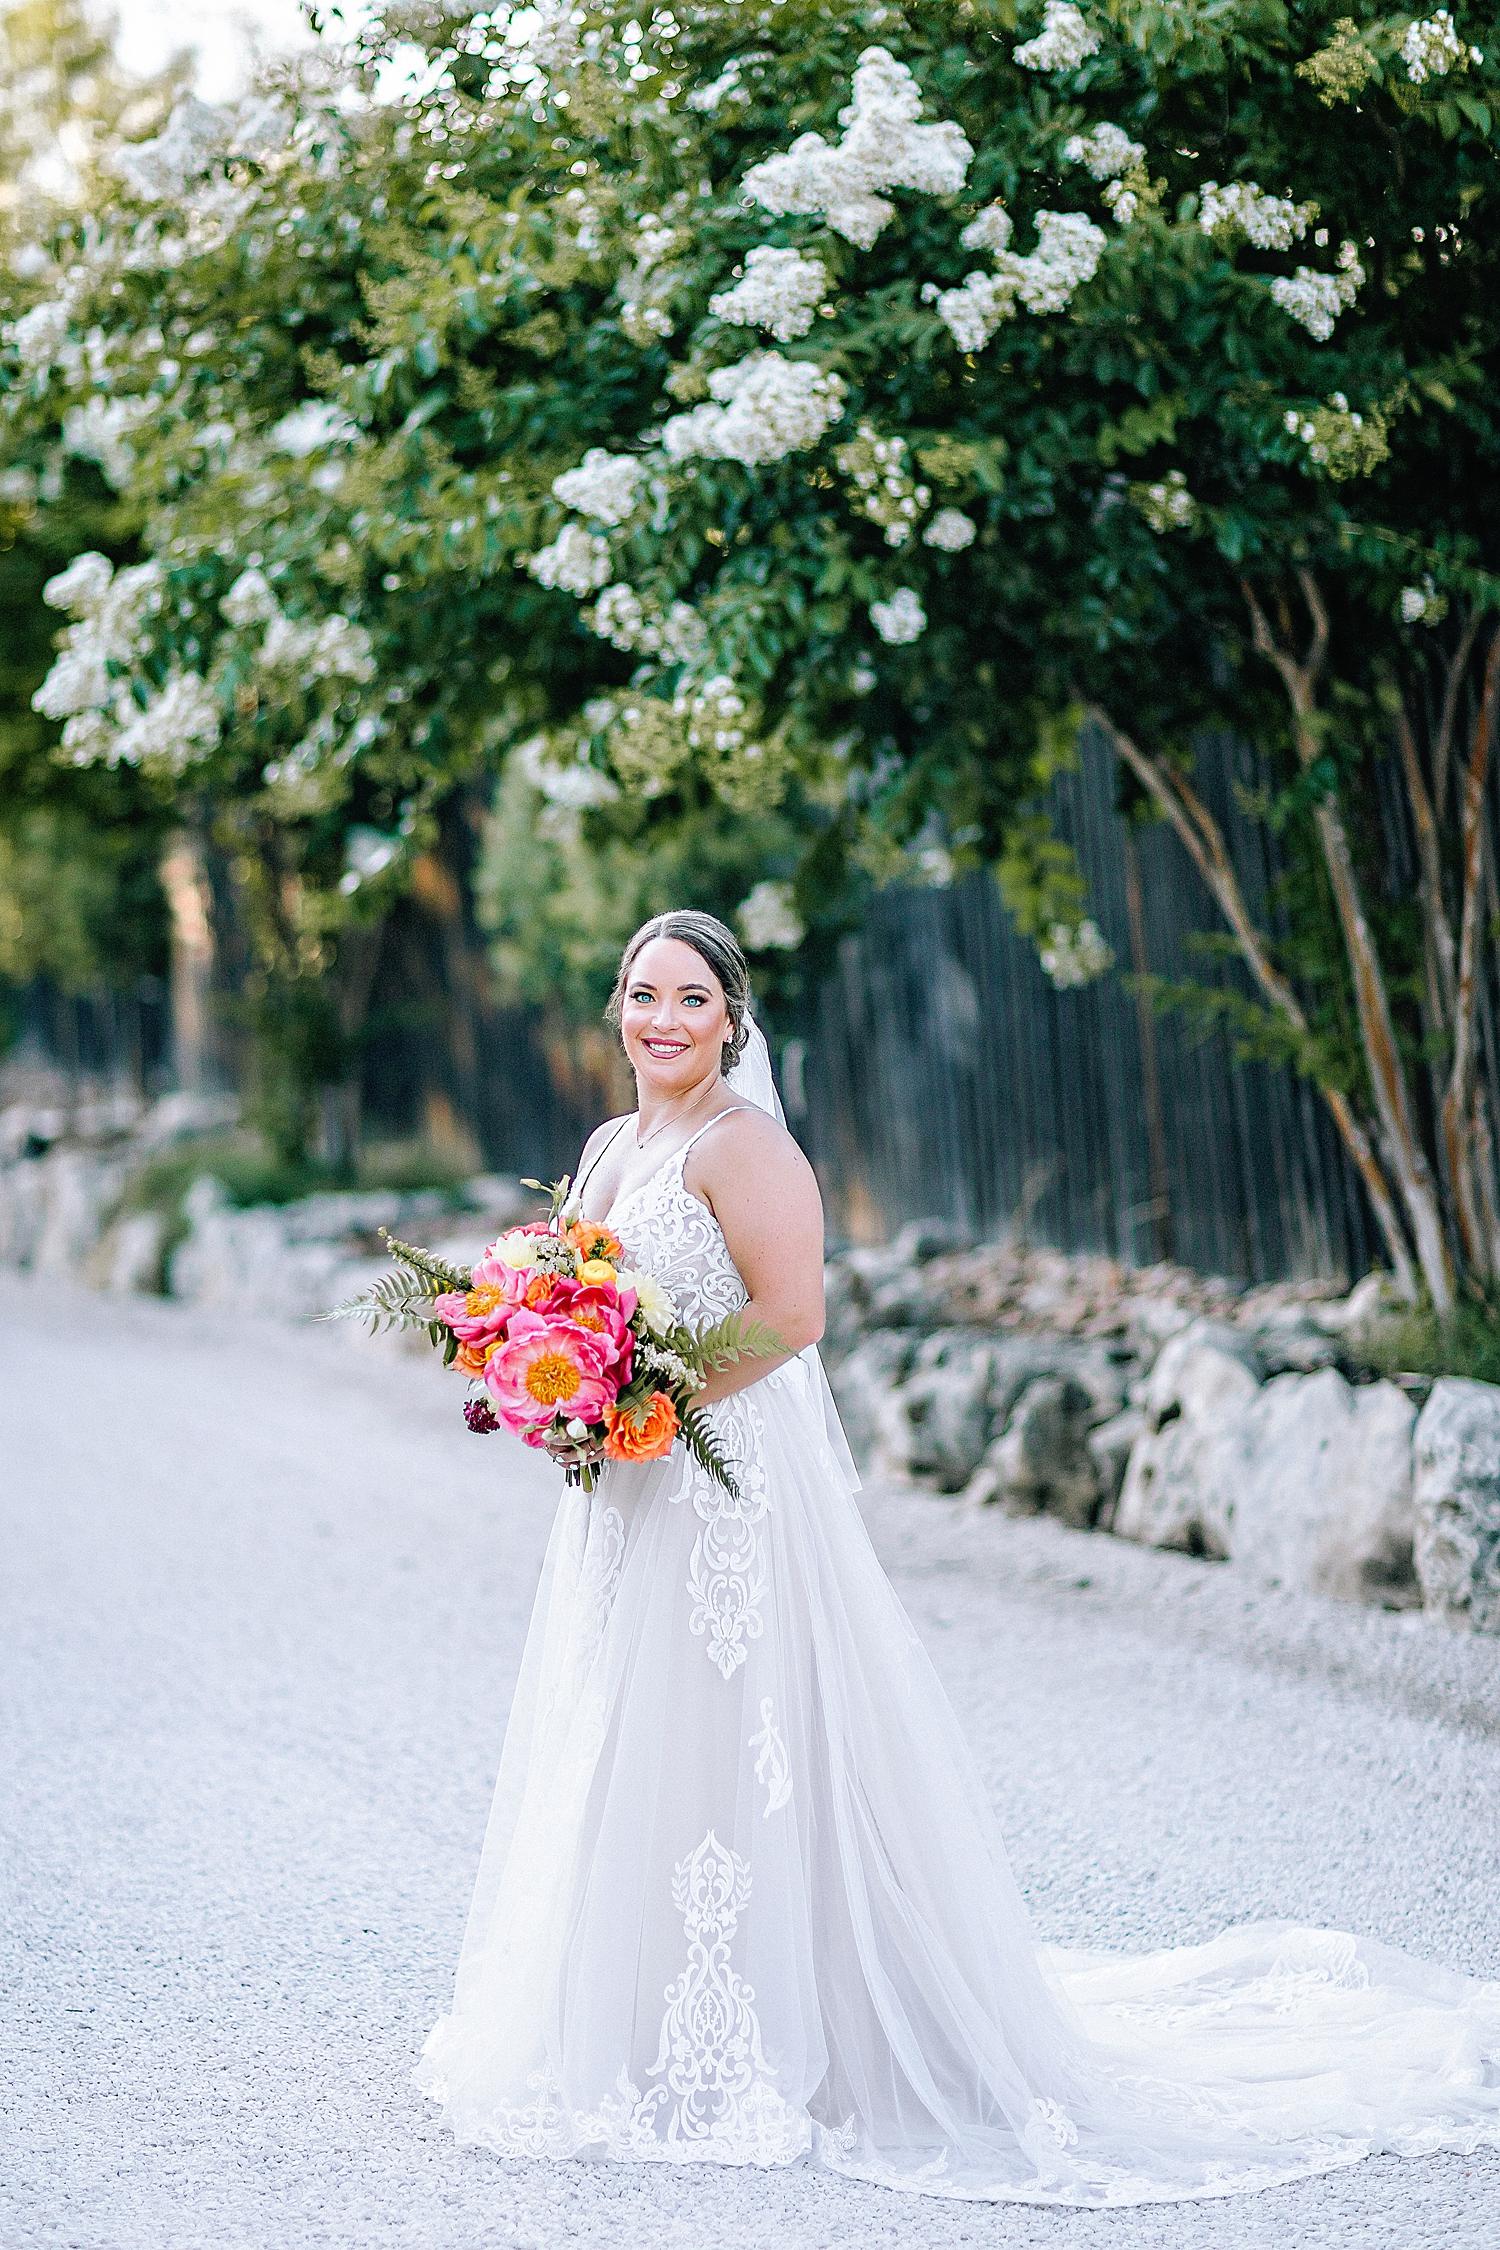 Gruene-Estate-Wedding-New-Braunfels-Bride-Bridal-Photos-Carly-Barton-Photography_0025.jpg